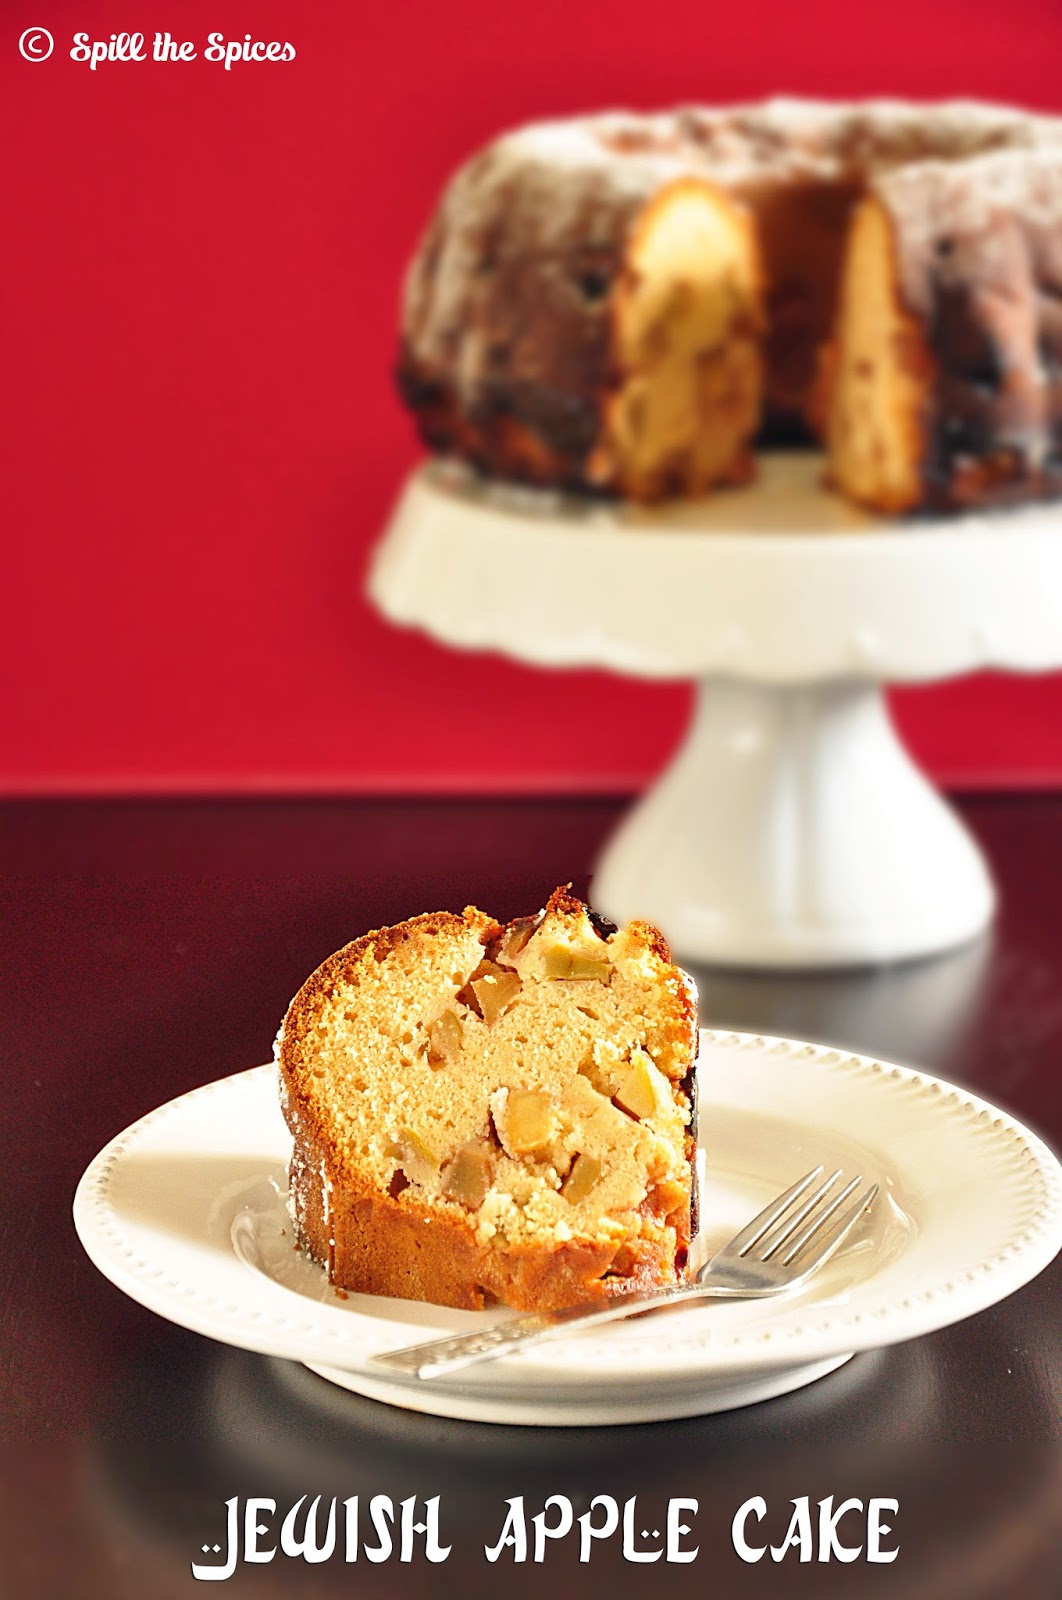 Jewish Apple Cake With Crumb Topping